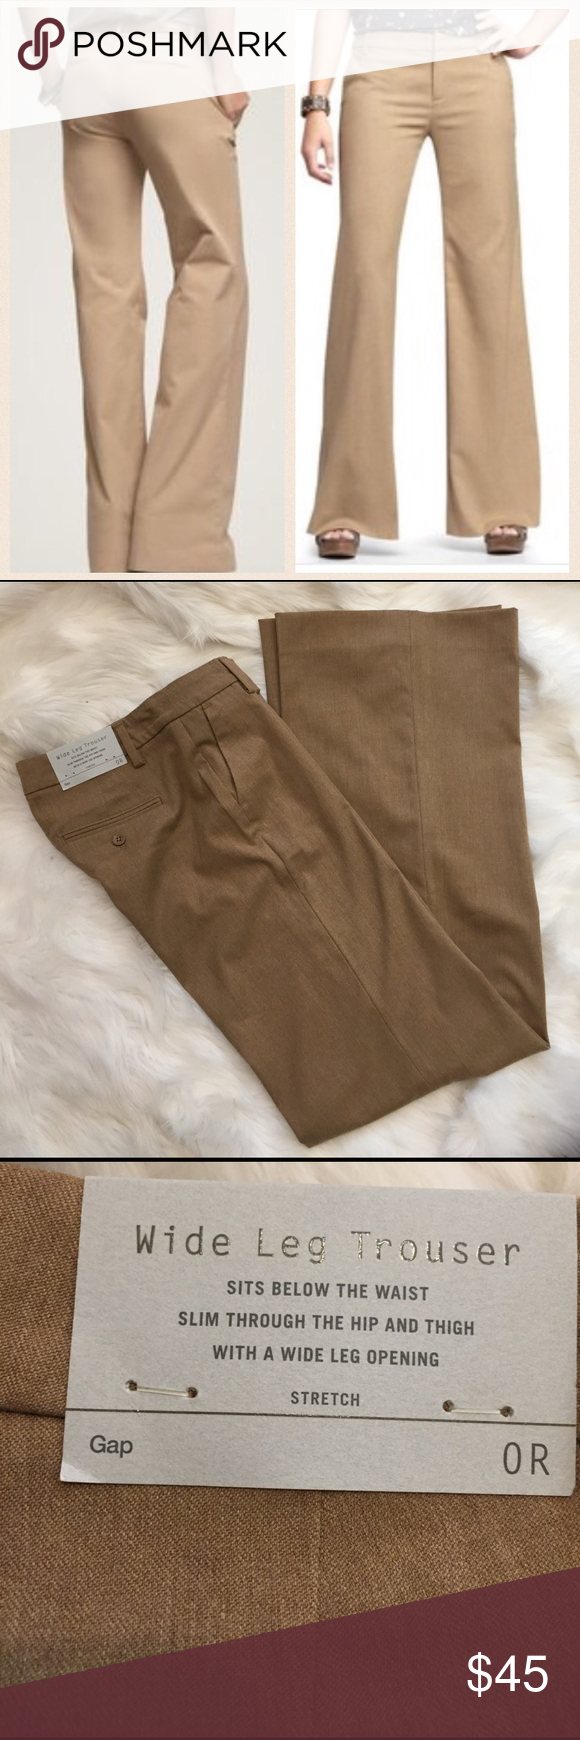 "Business Casual GAP Gap wide leg trouser. NEW!!! Across waist 14.5"". Rise 8"". Inseam 34"" GAP Pants Trousers"